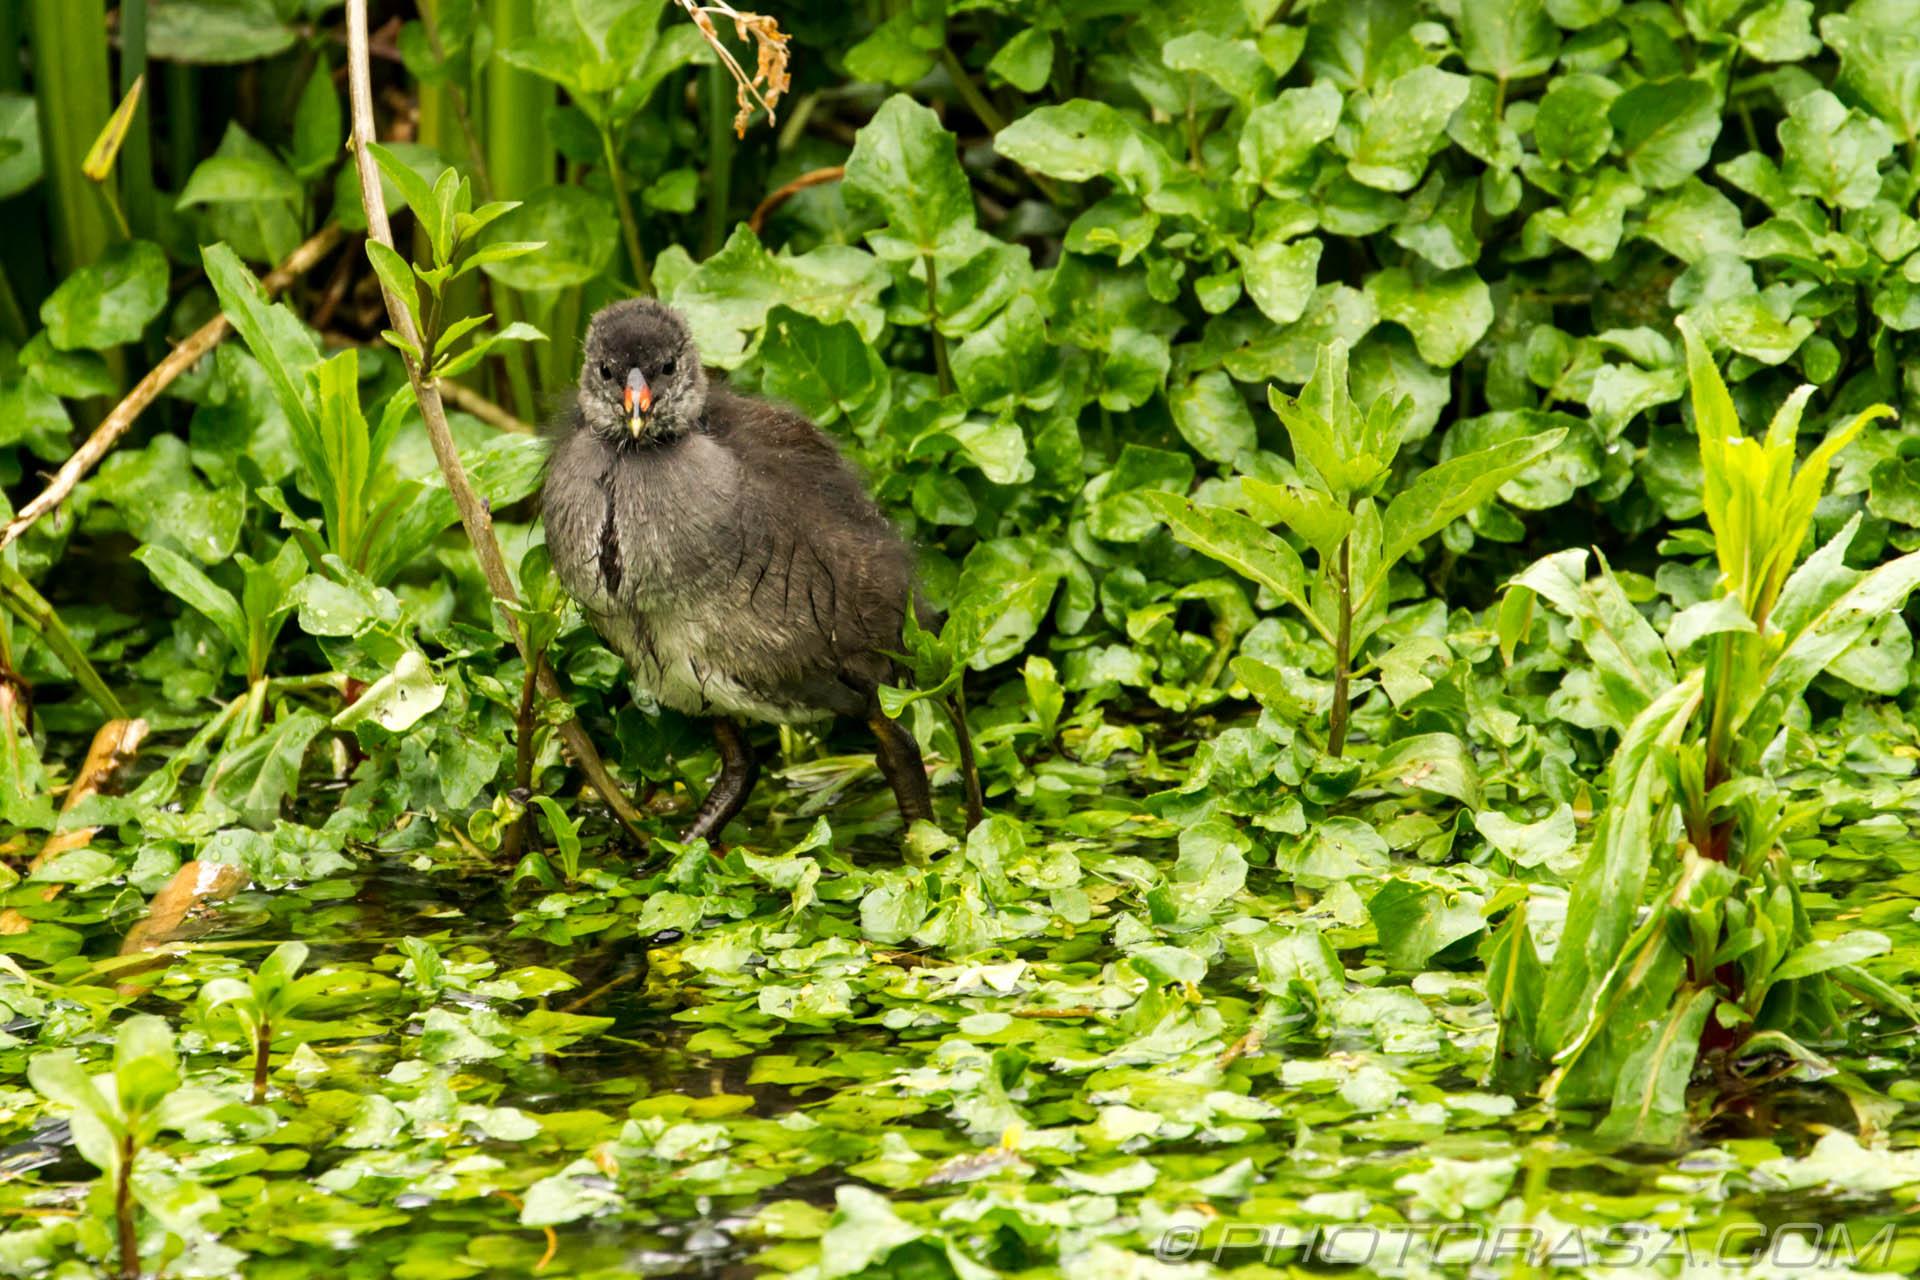 http://photorasa.com/baby-moorhens/moorhen-chick-among-the-plants/